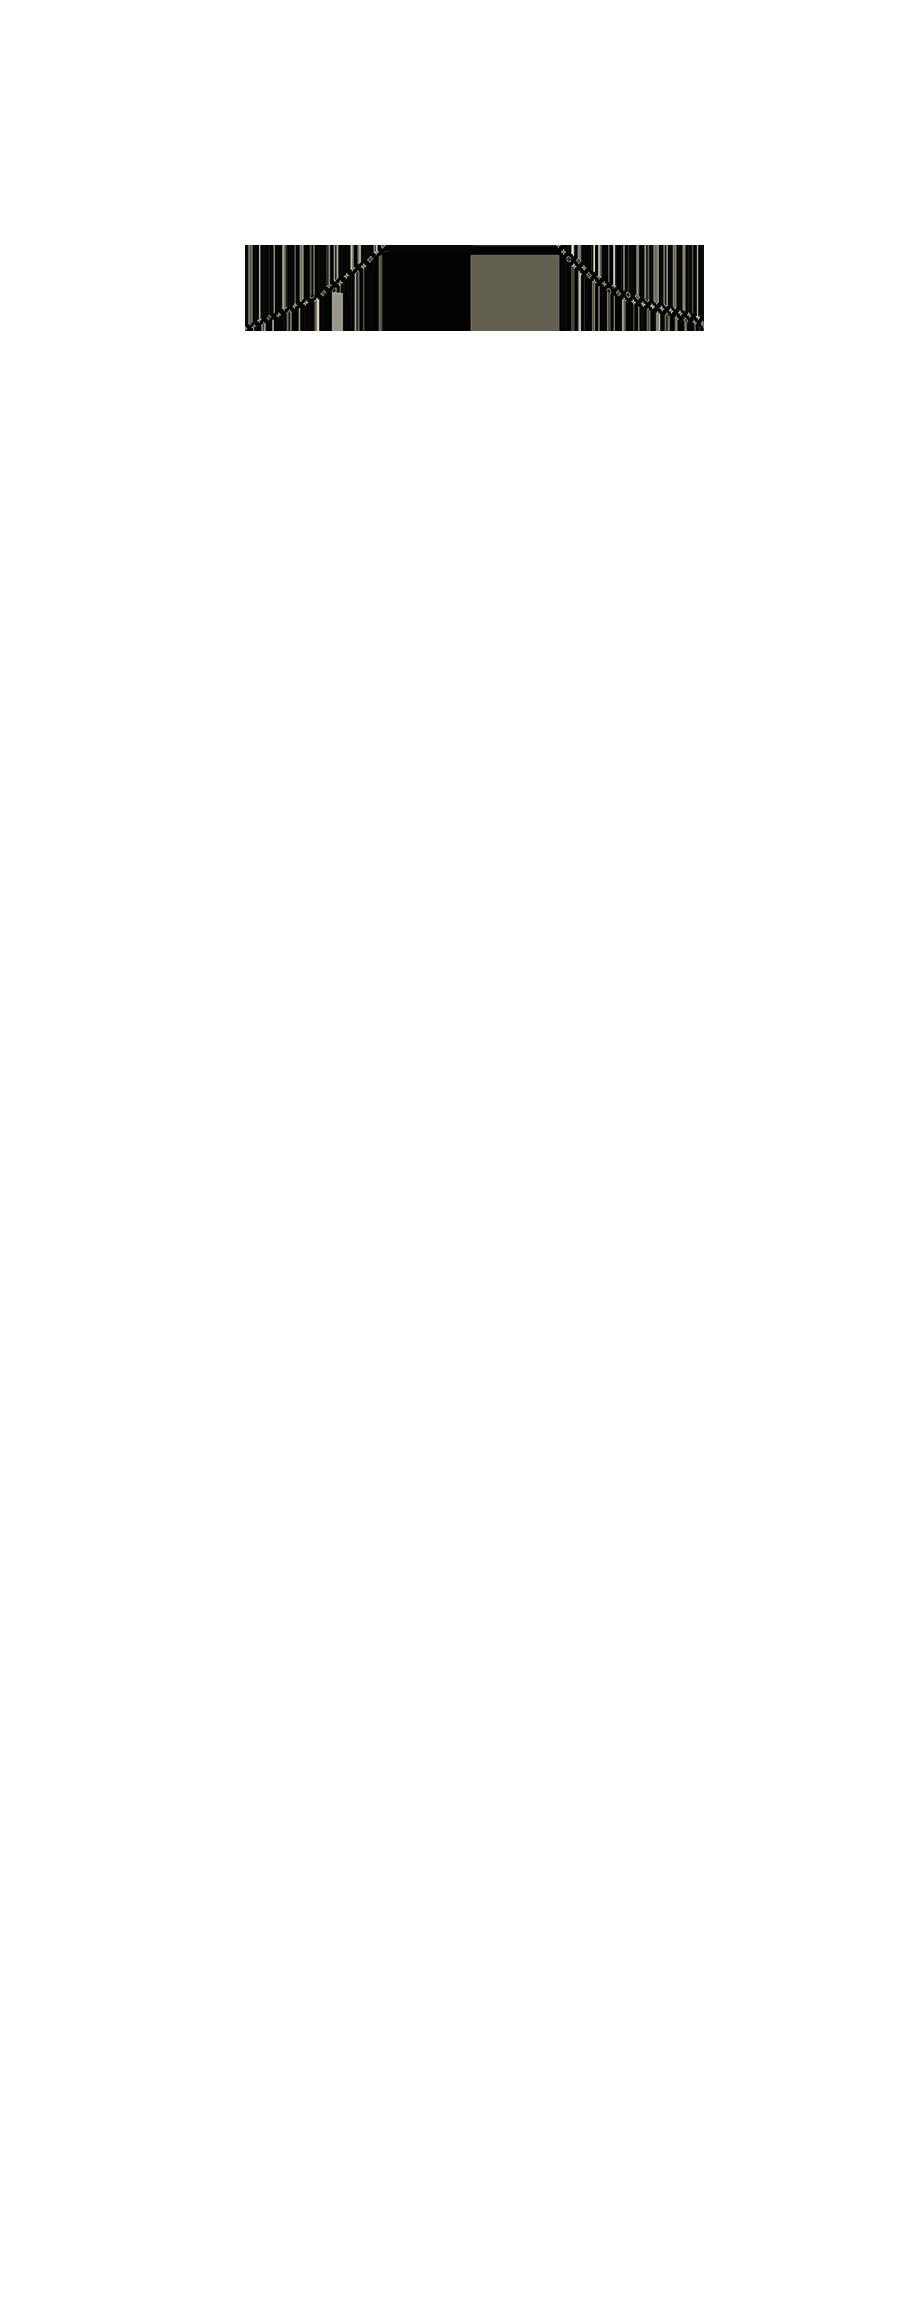 NEFL-8